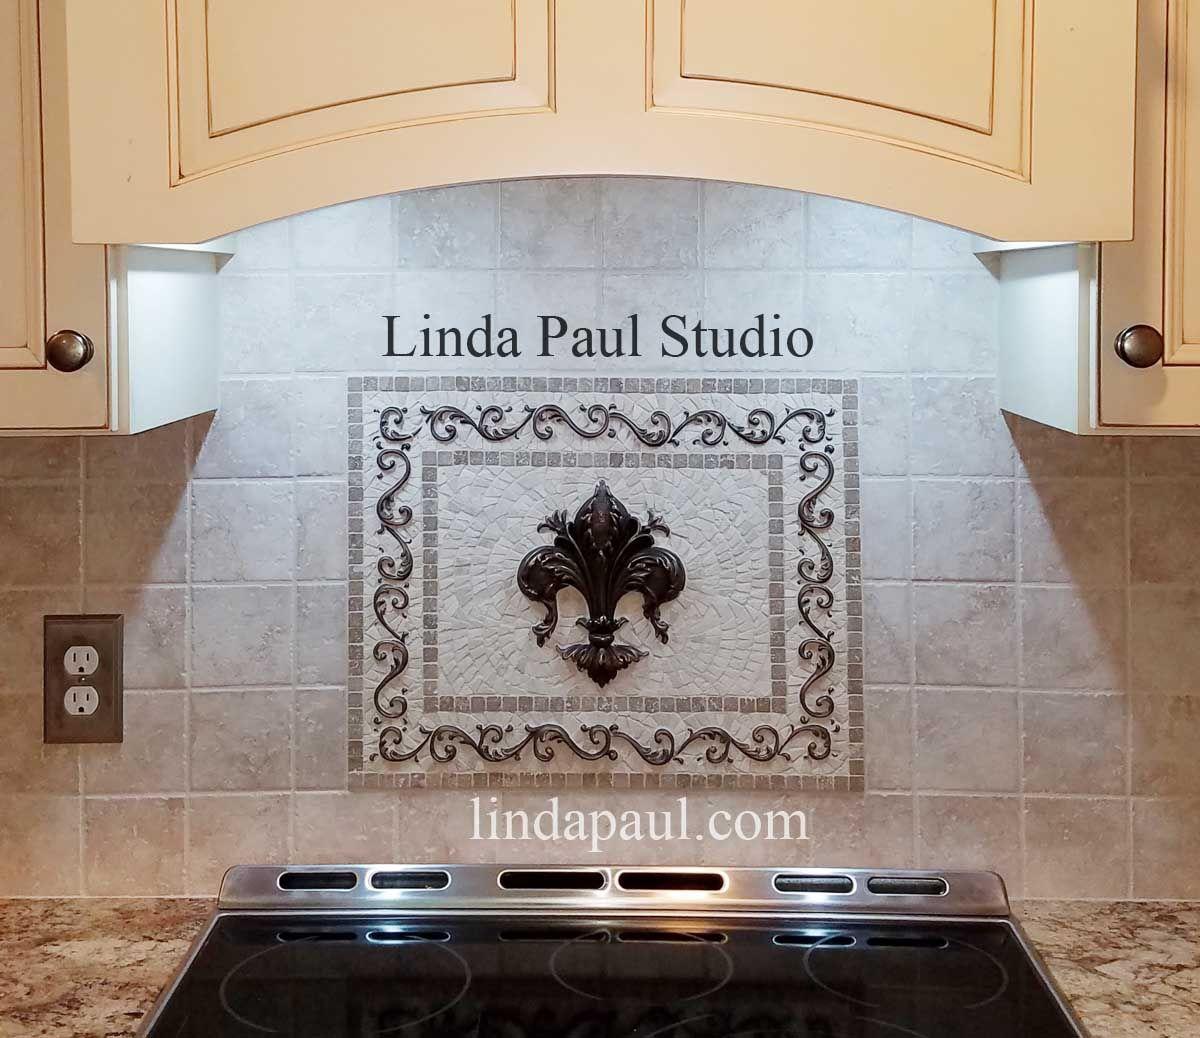 Small Fleur De Lis Backsplash Medallion With Bronze Metal And Travertine Mosaic Tiles Mosaic Medallion Travertine Mosaic Tiles Mosaic Tiles